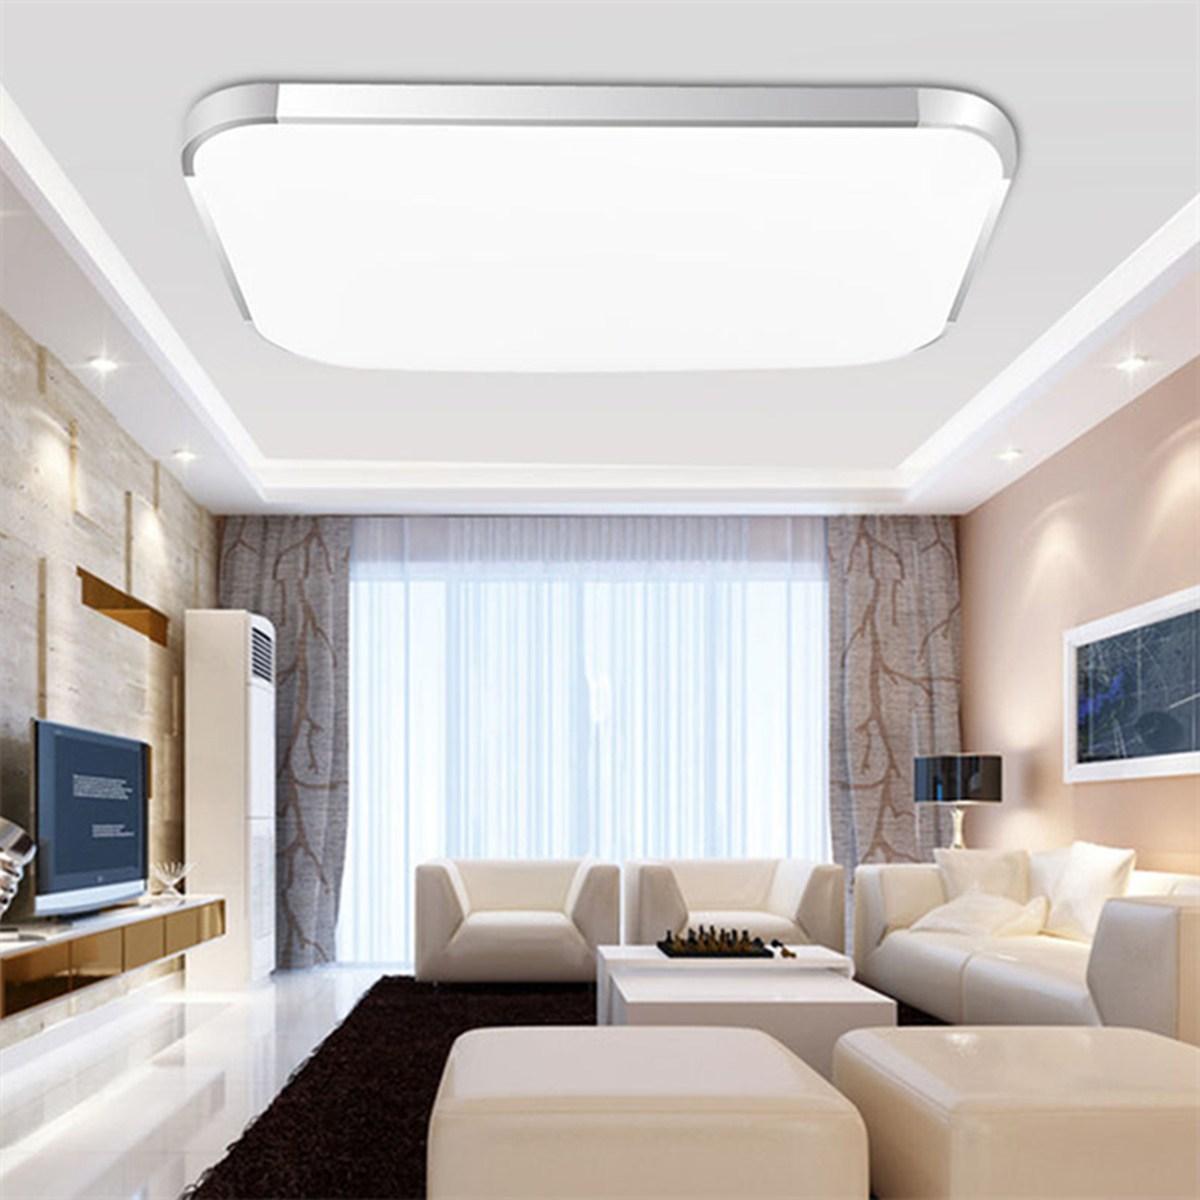 Modern Square LED Night Light 12W 18W 24W Ceiling Lamp Kitchen Bedroom Living Room Home Indoor Lighting Decor